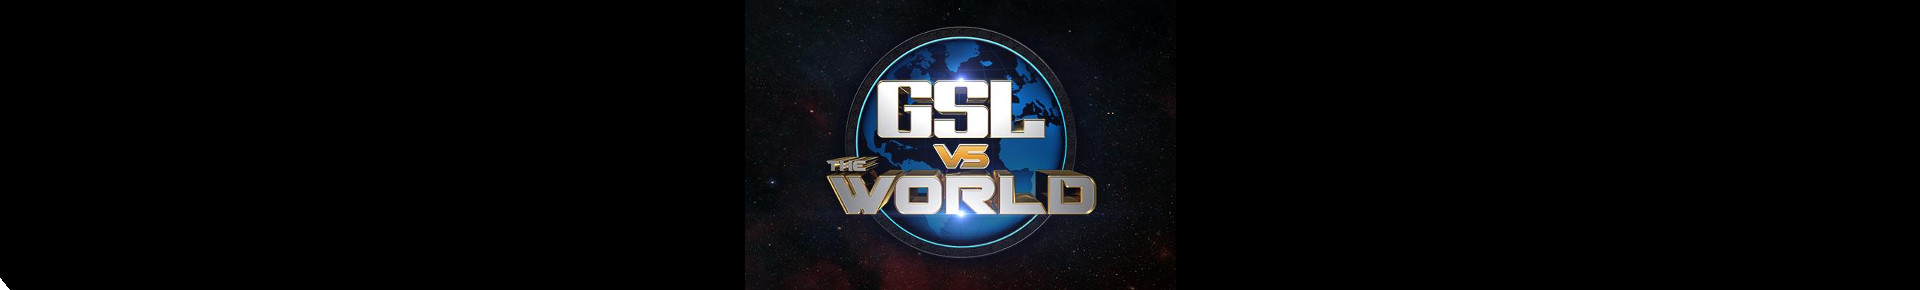 2019 GSL vs the World